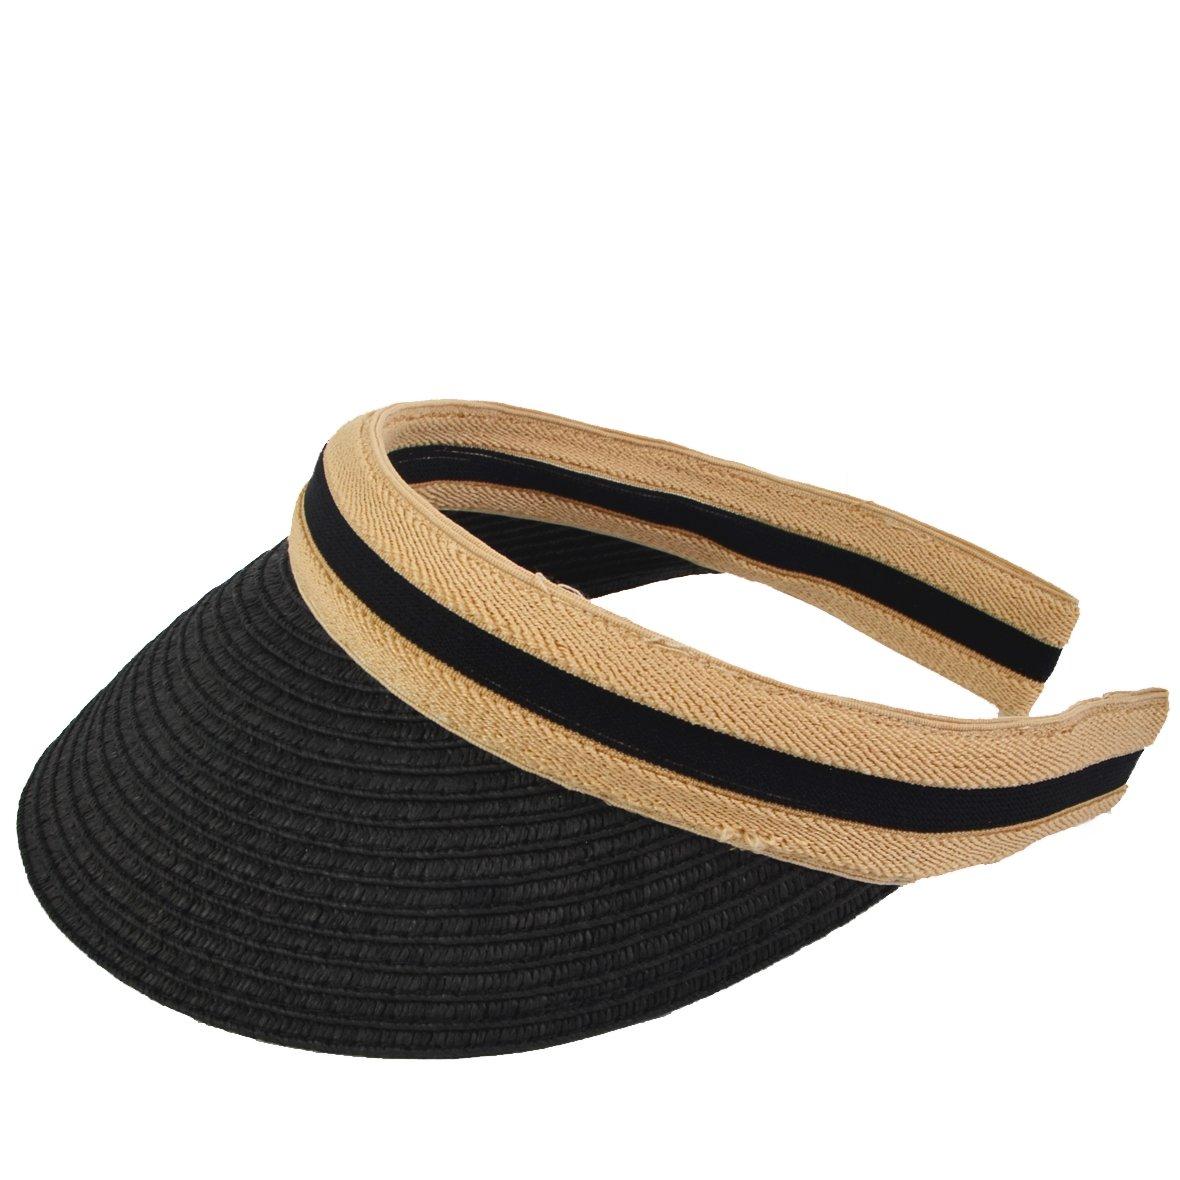 3d390680be0 Women Golf Sports Visor - Sun Hat Beach Straw Summer Visors Cap (Black)   Amazon.co.uk  Clothing